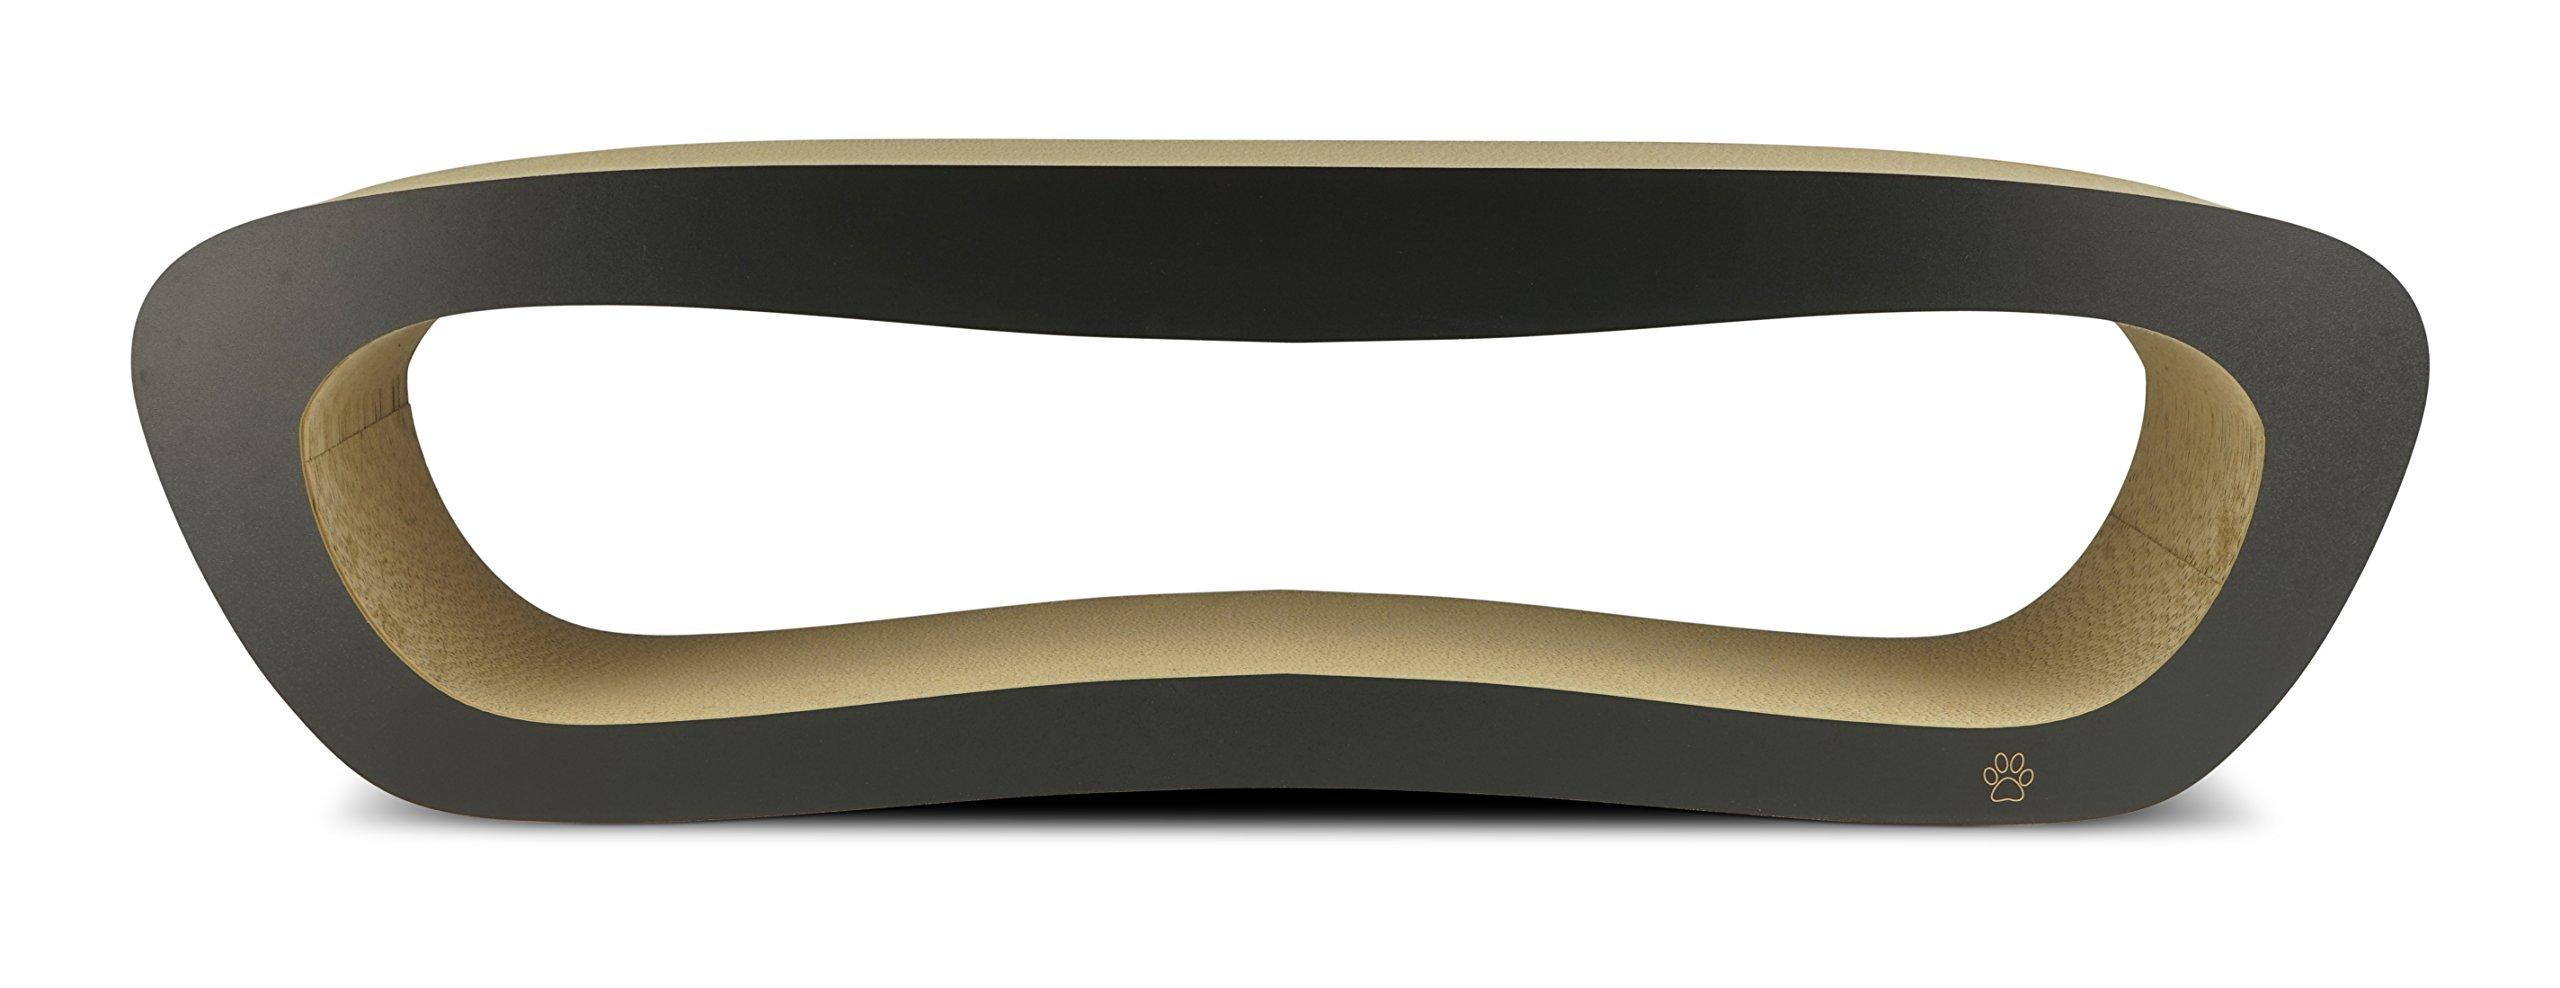 Oliver & Iris Premium Cat Scratcher Hollow Long Curved Lounger, X-Large, Black